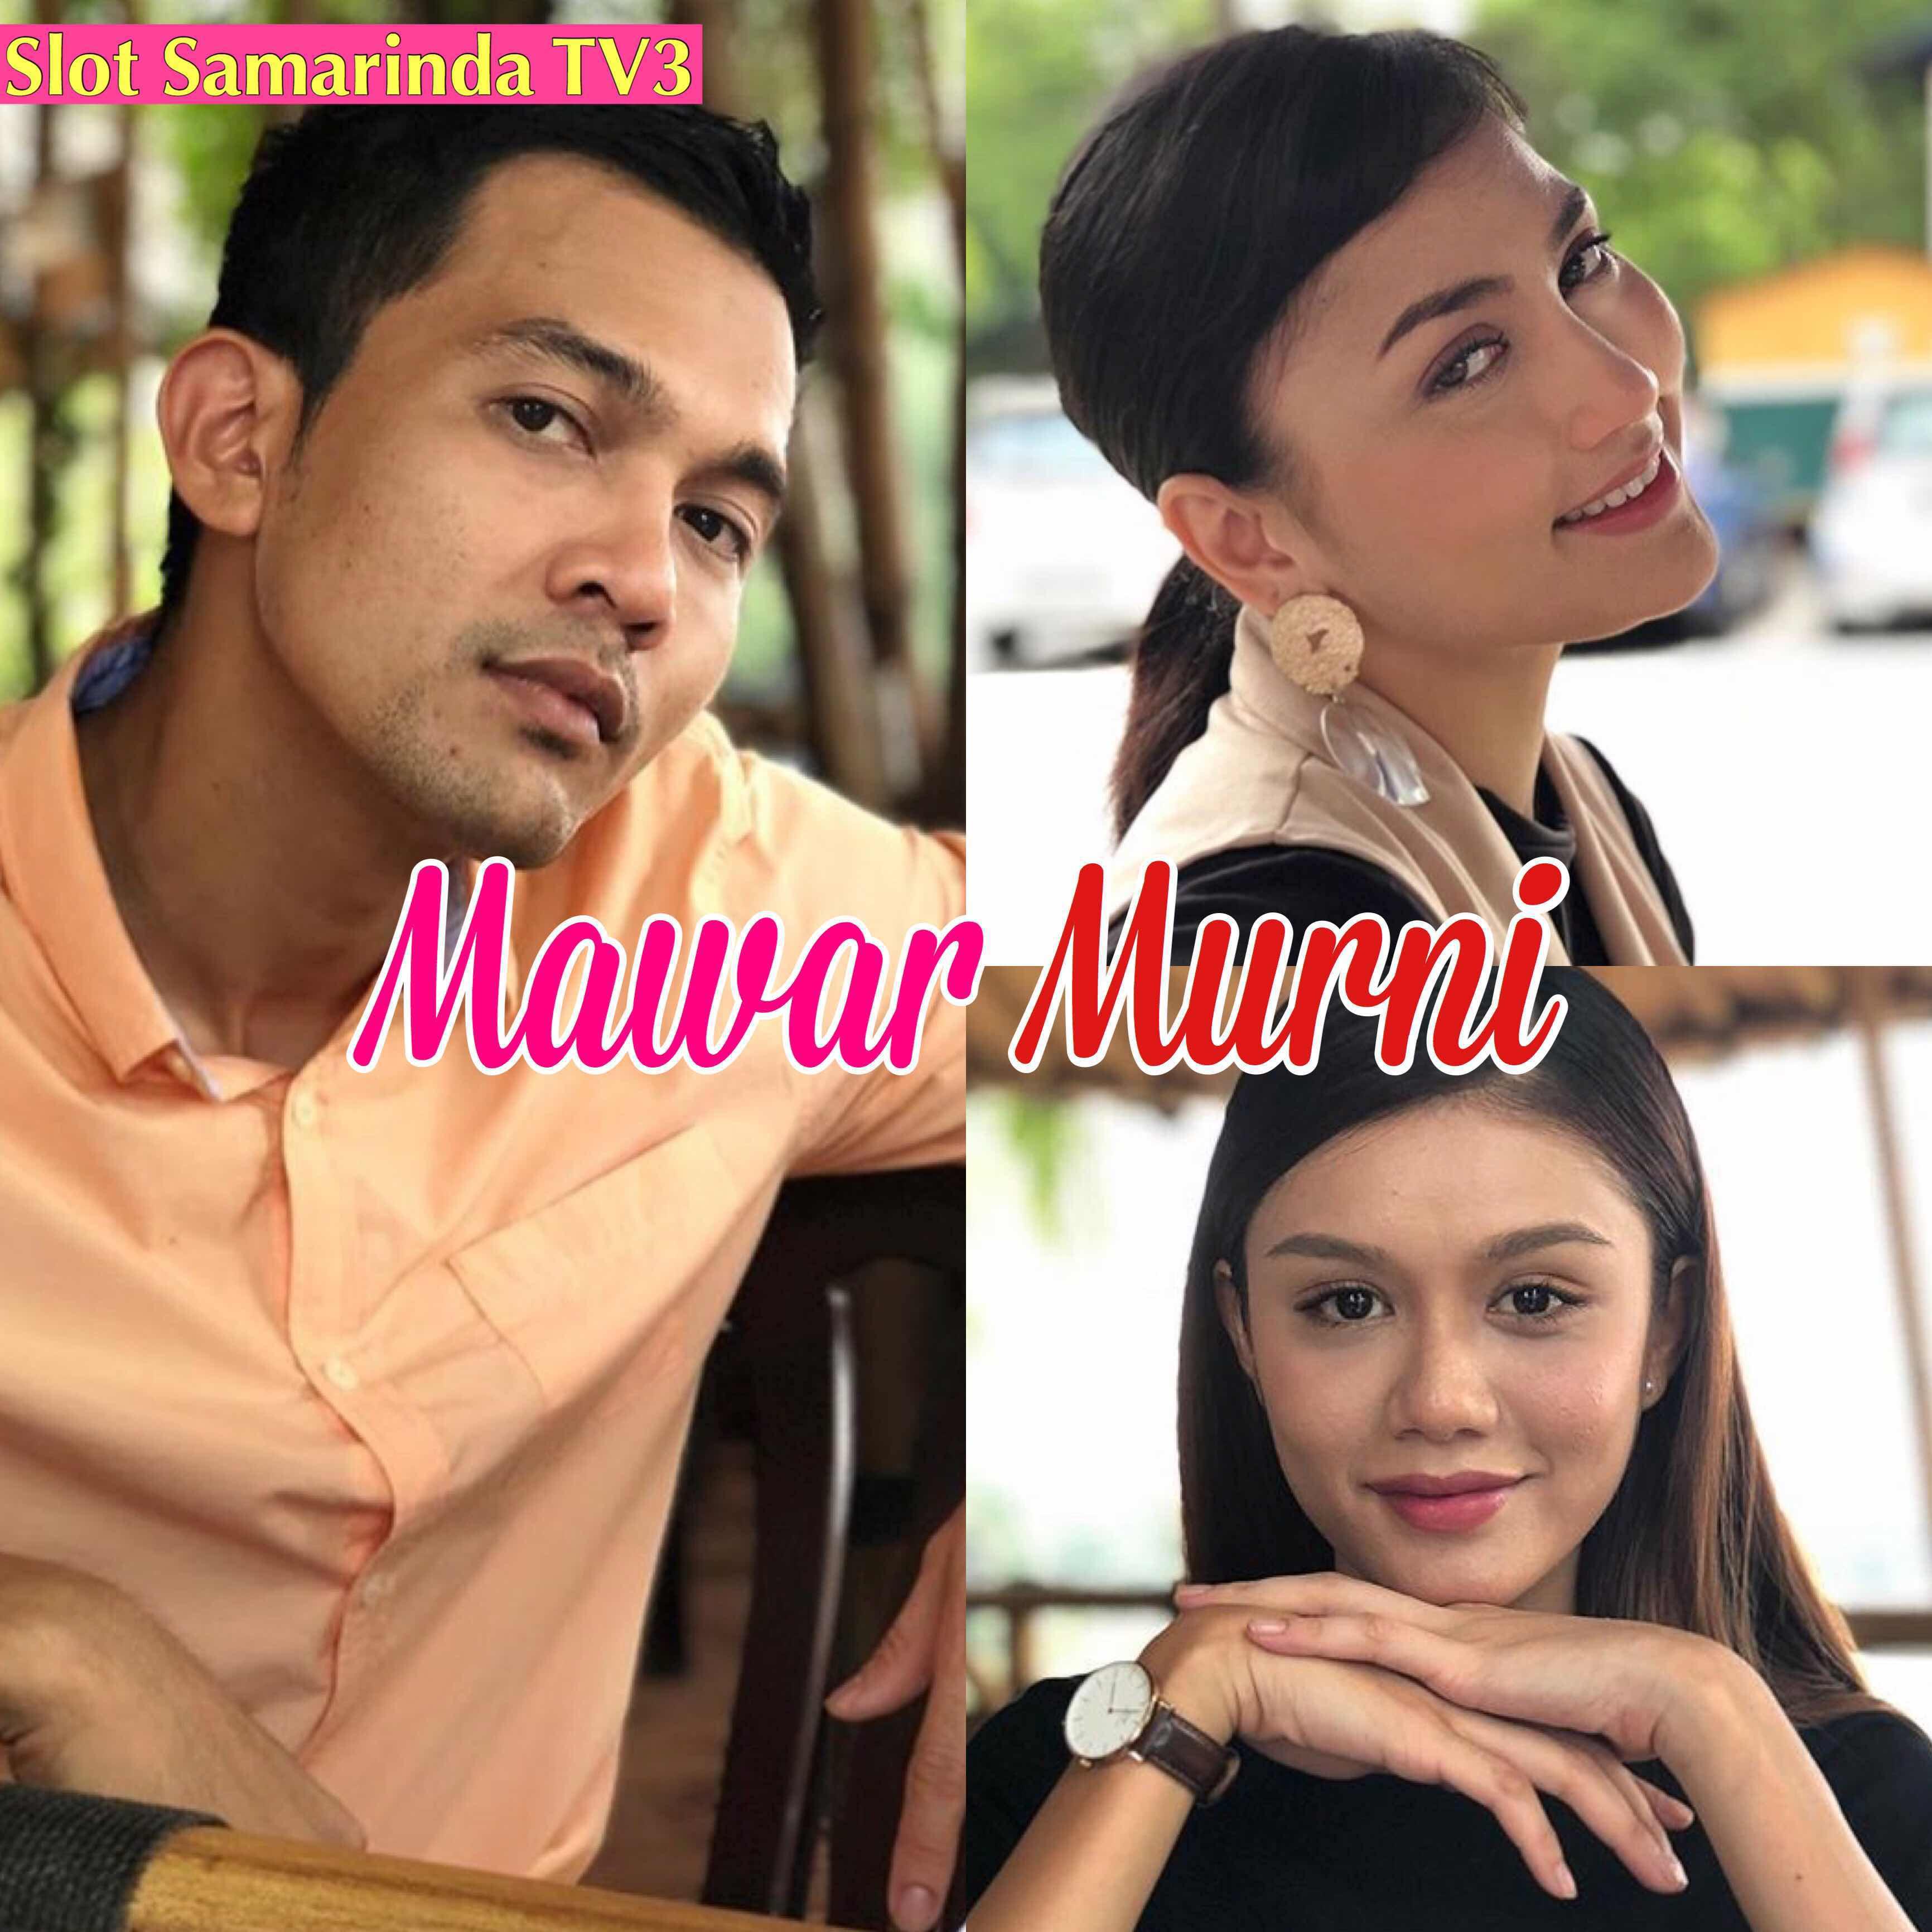 %255BUNSET%255D - Sinopsis Drama Mawar Murni (slot Samarinda TV3)